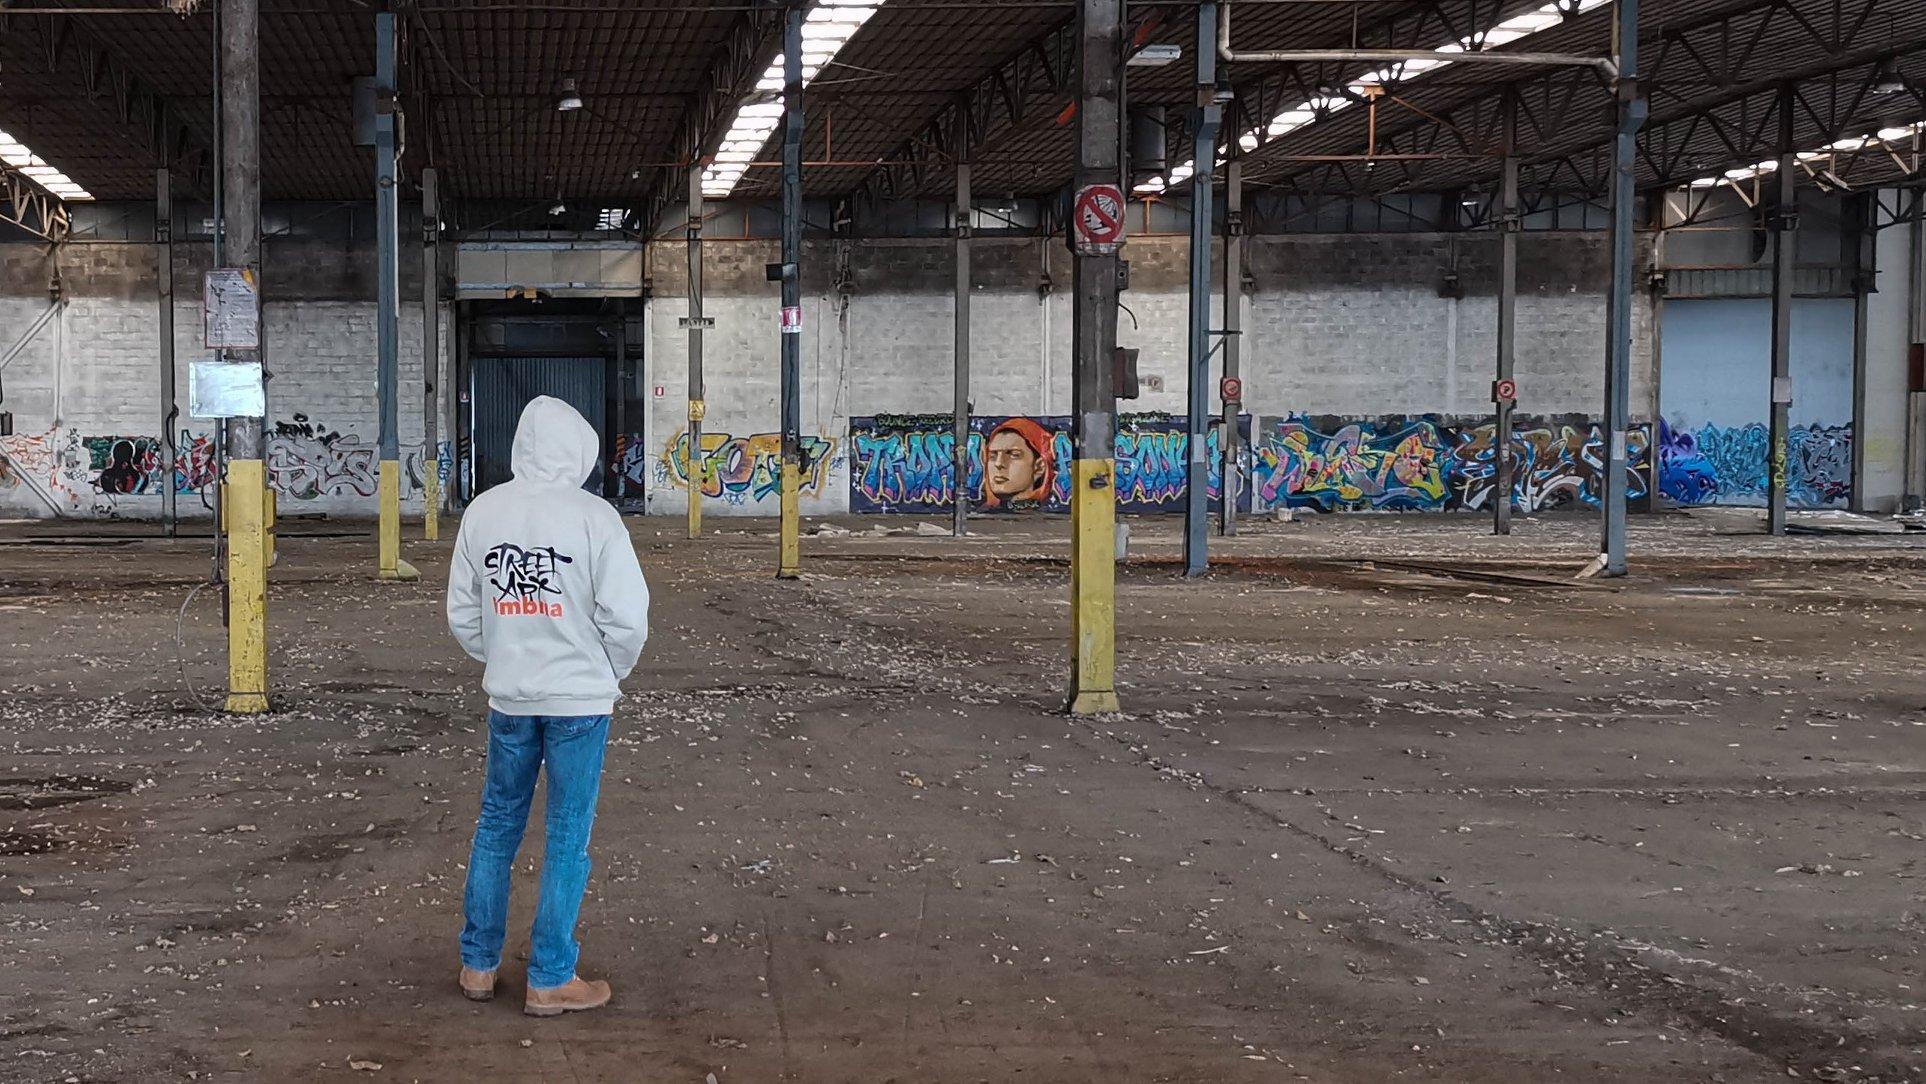 Street art in una fabbrica abbandonata